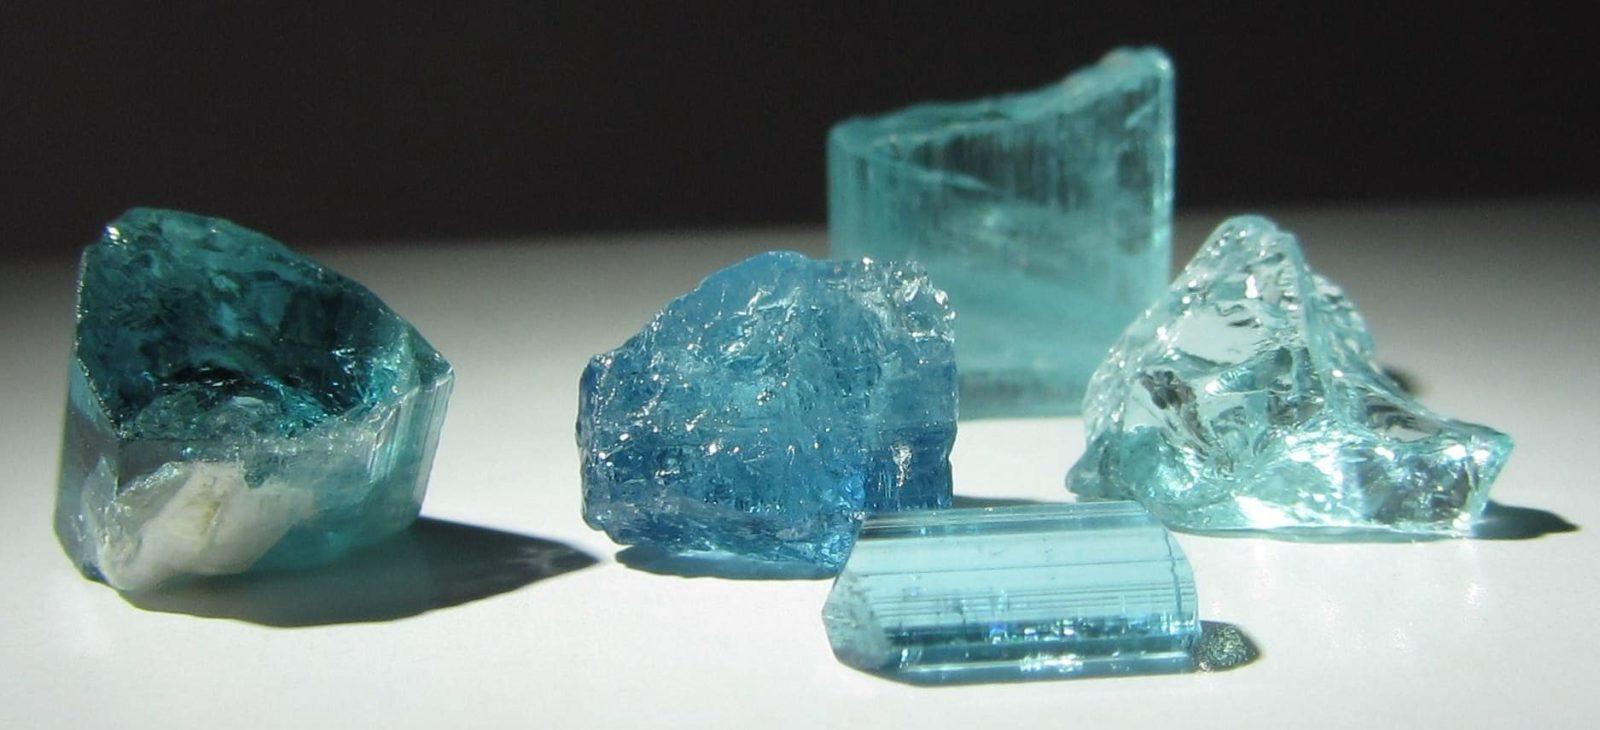 Голубой камень турмалин параиба